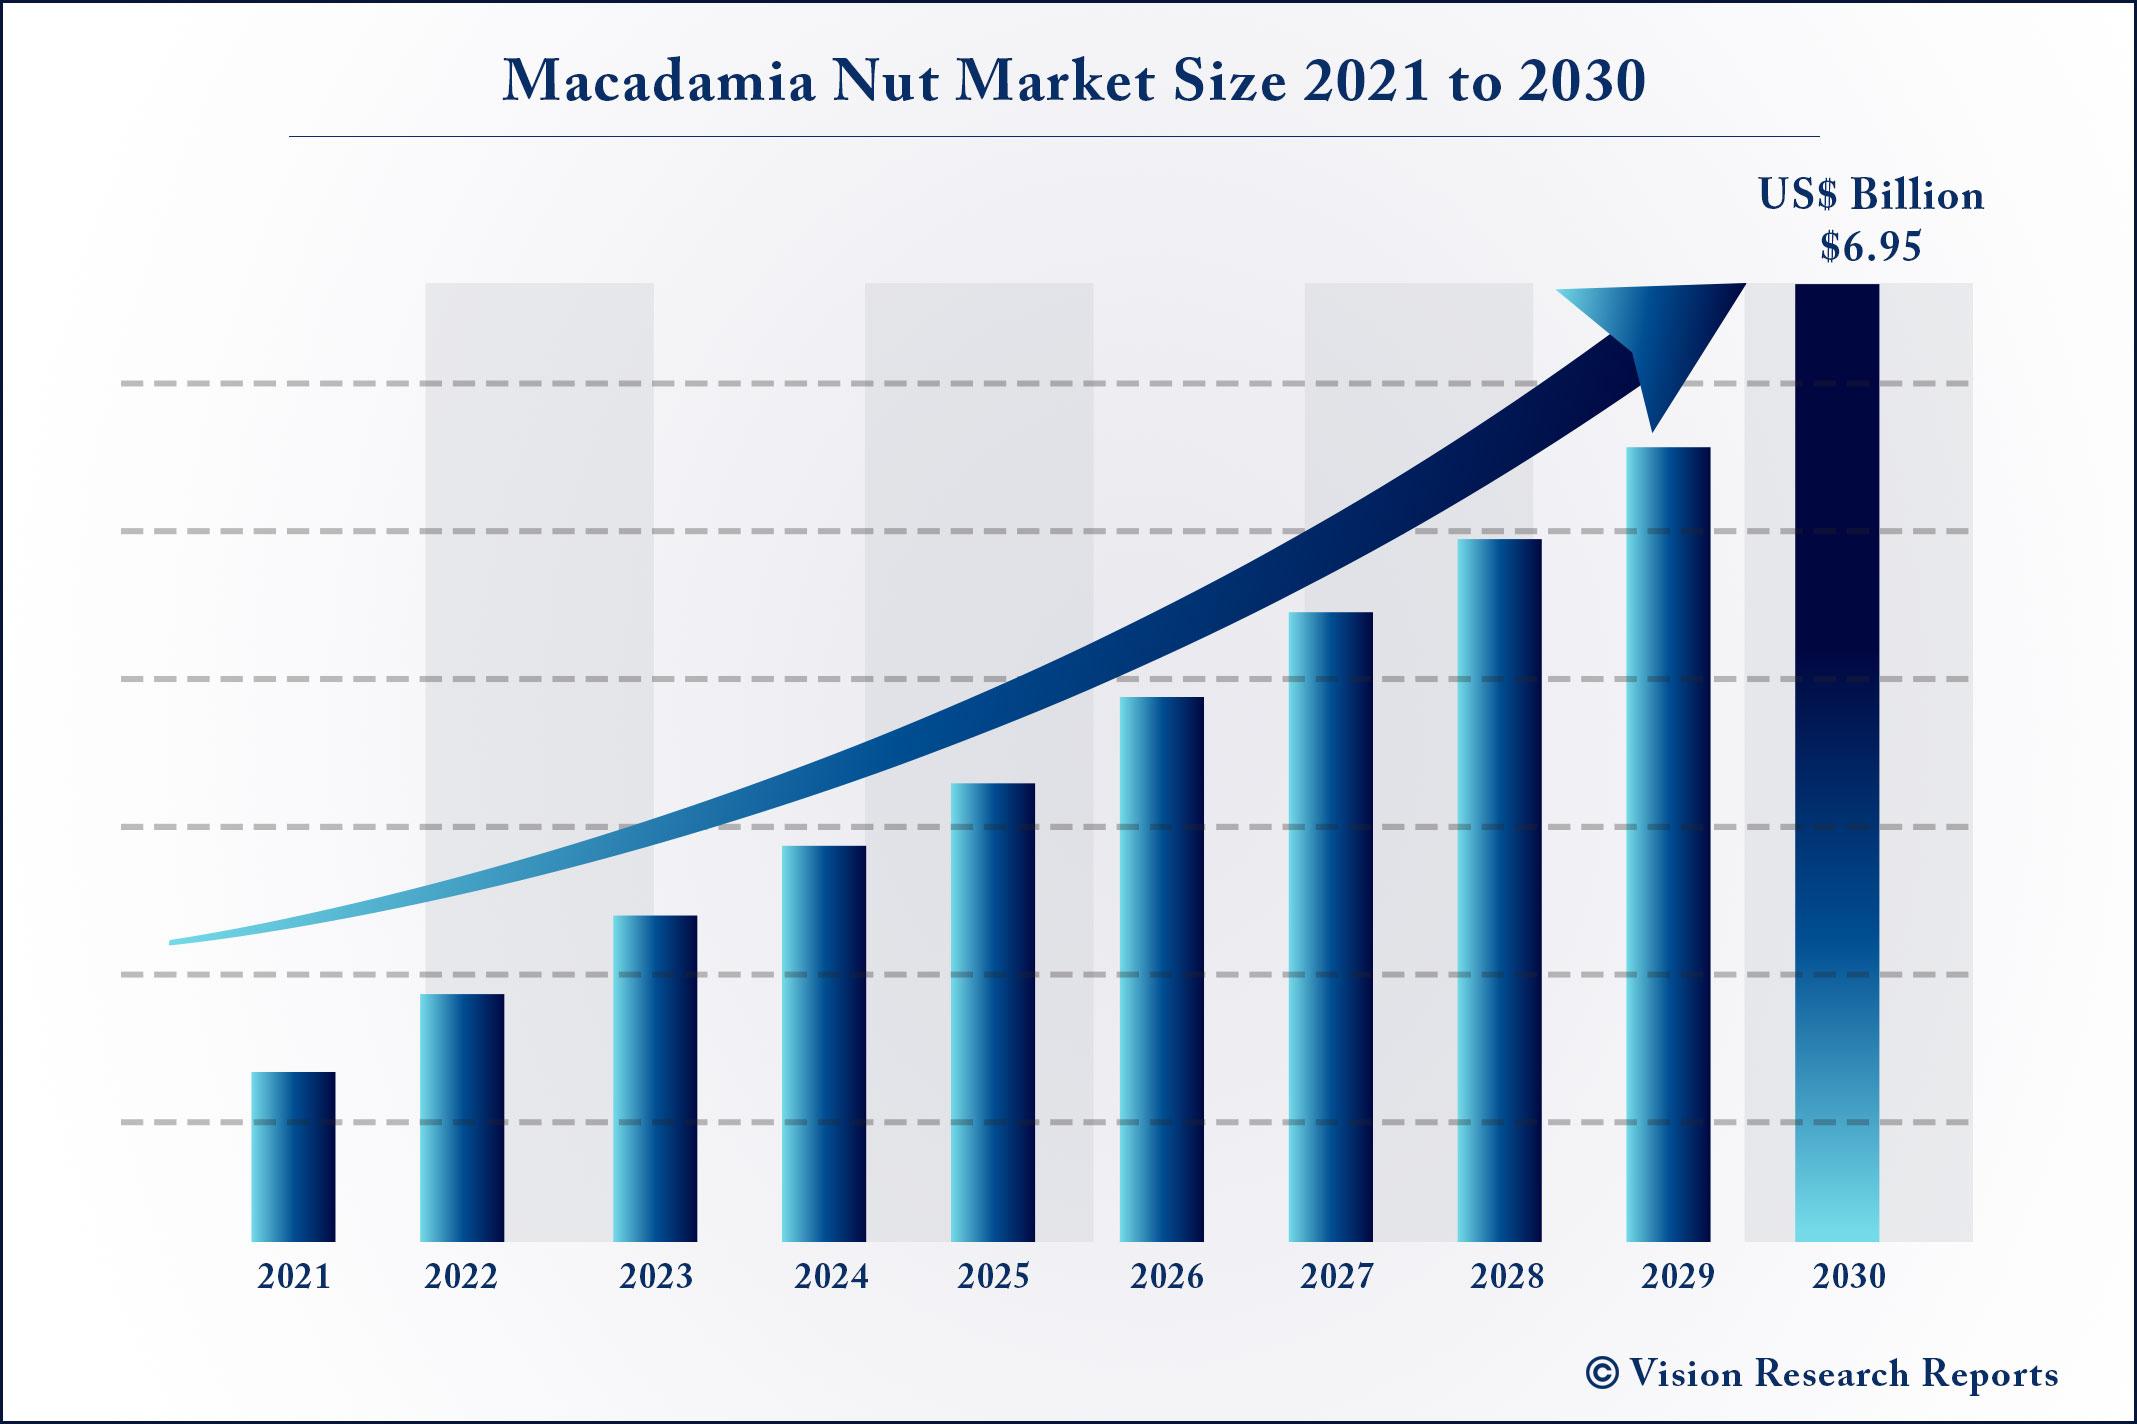 Macadamia Nut Market Size 2021 to 2030